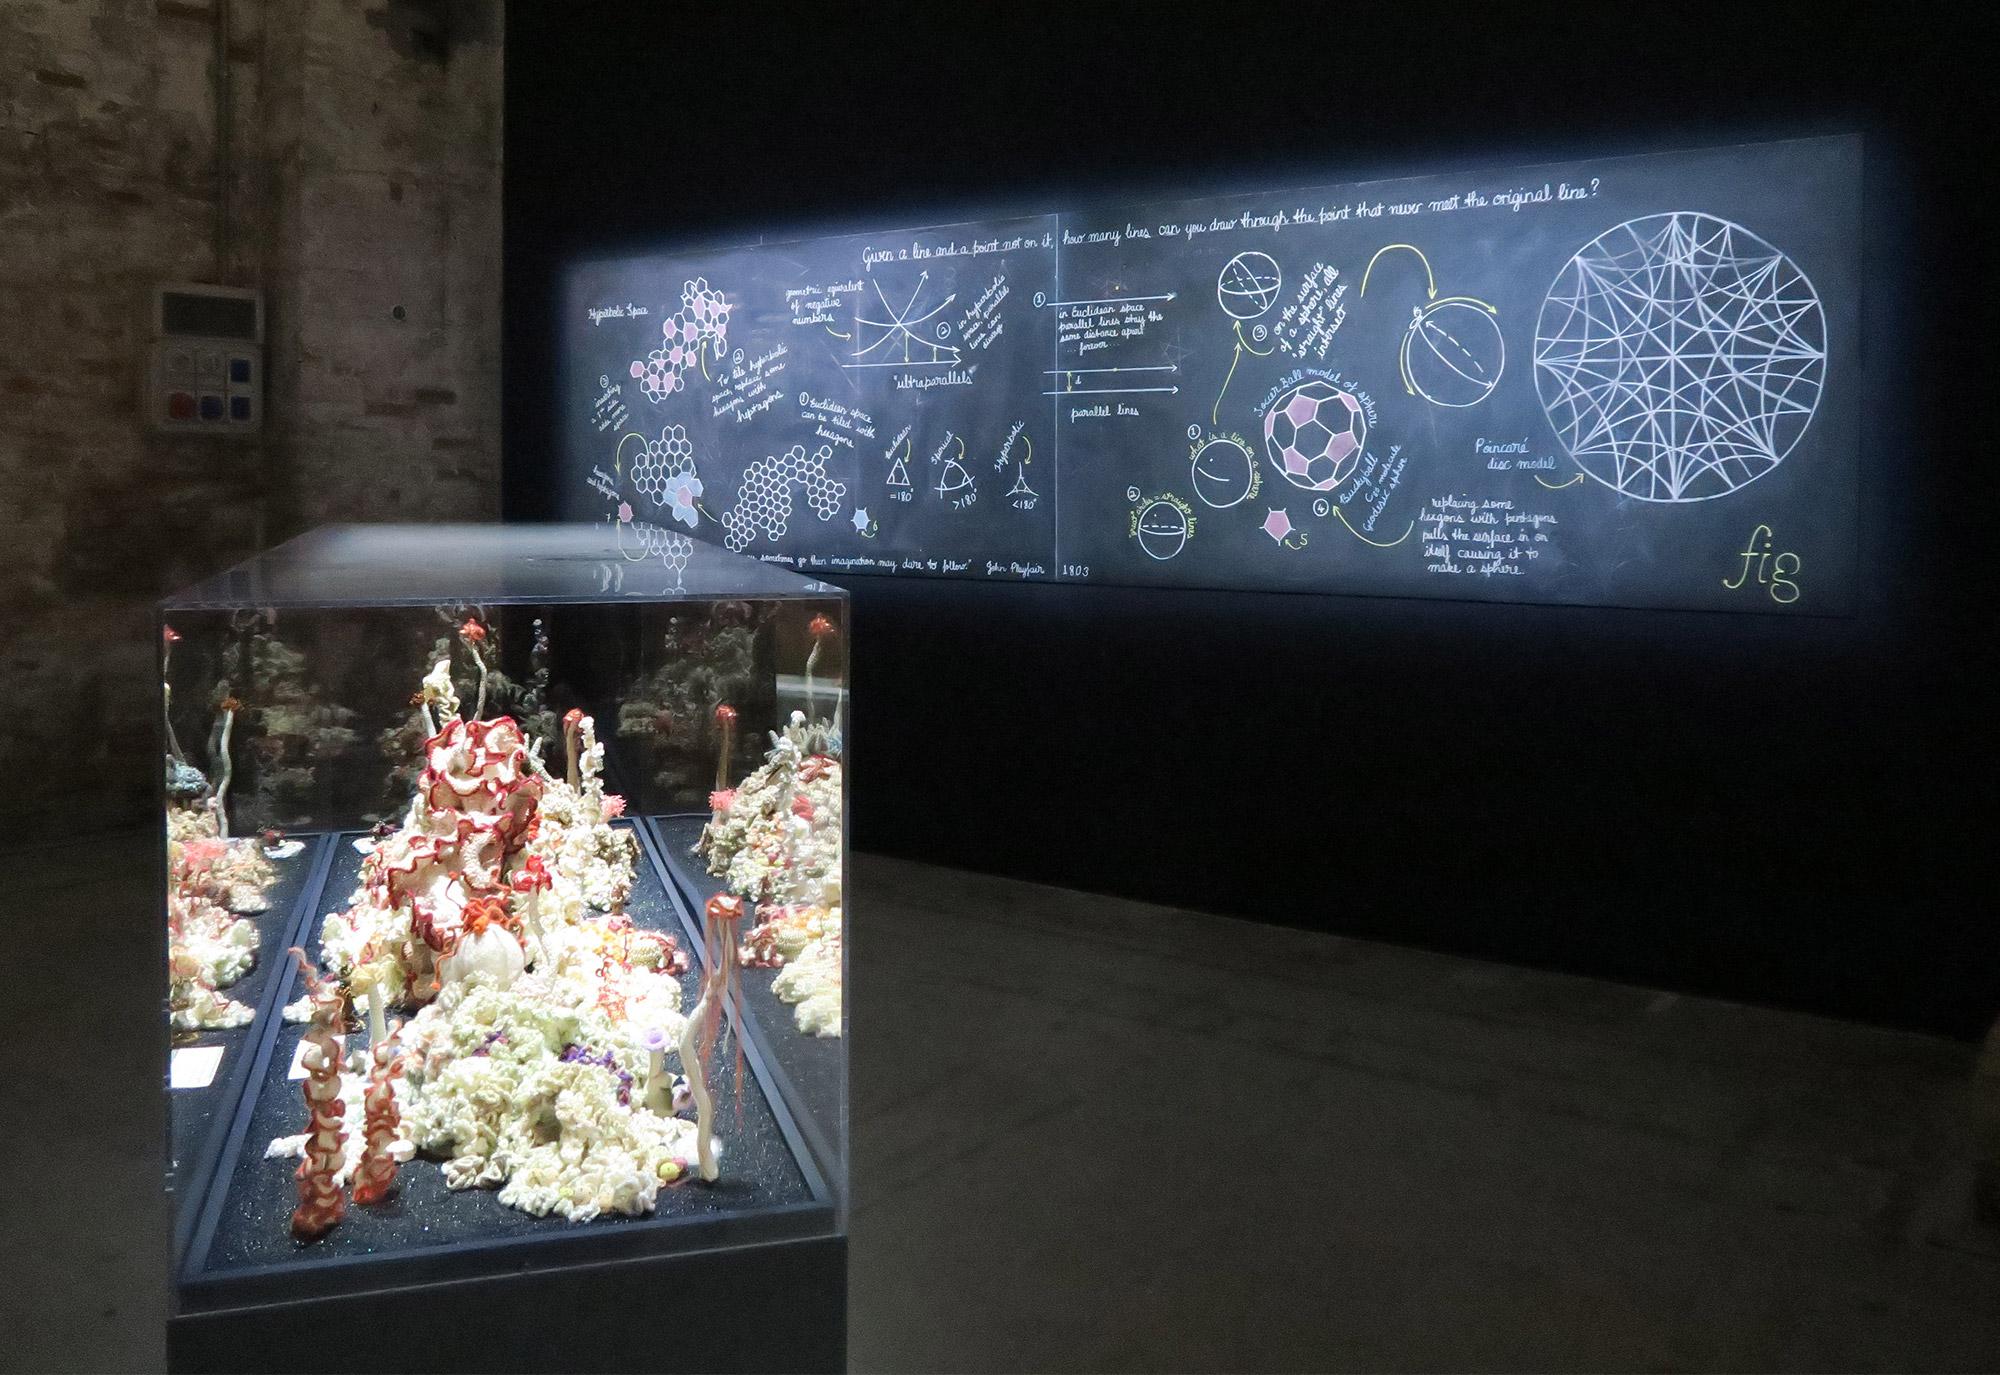 Reef sculpture in front of blackboard